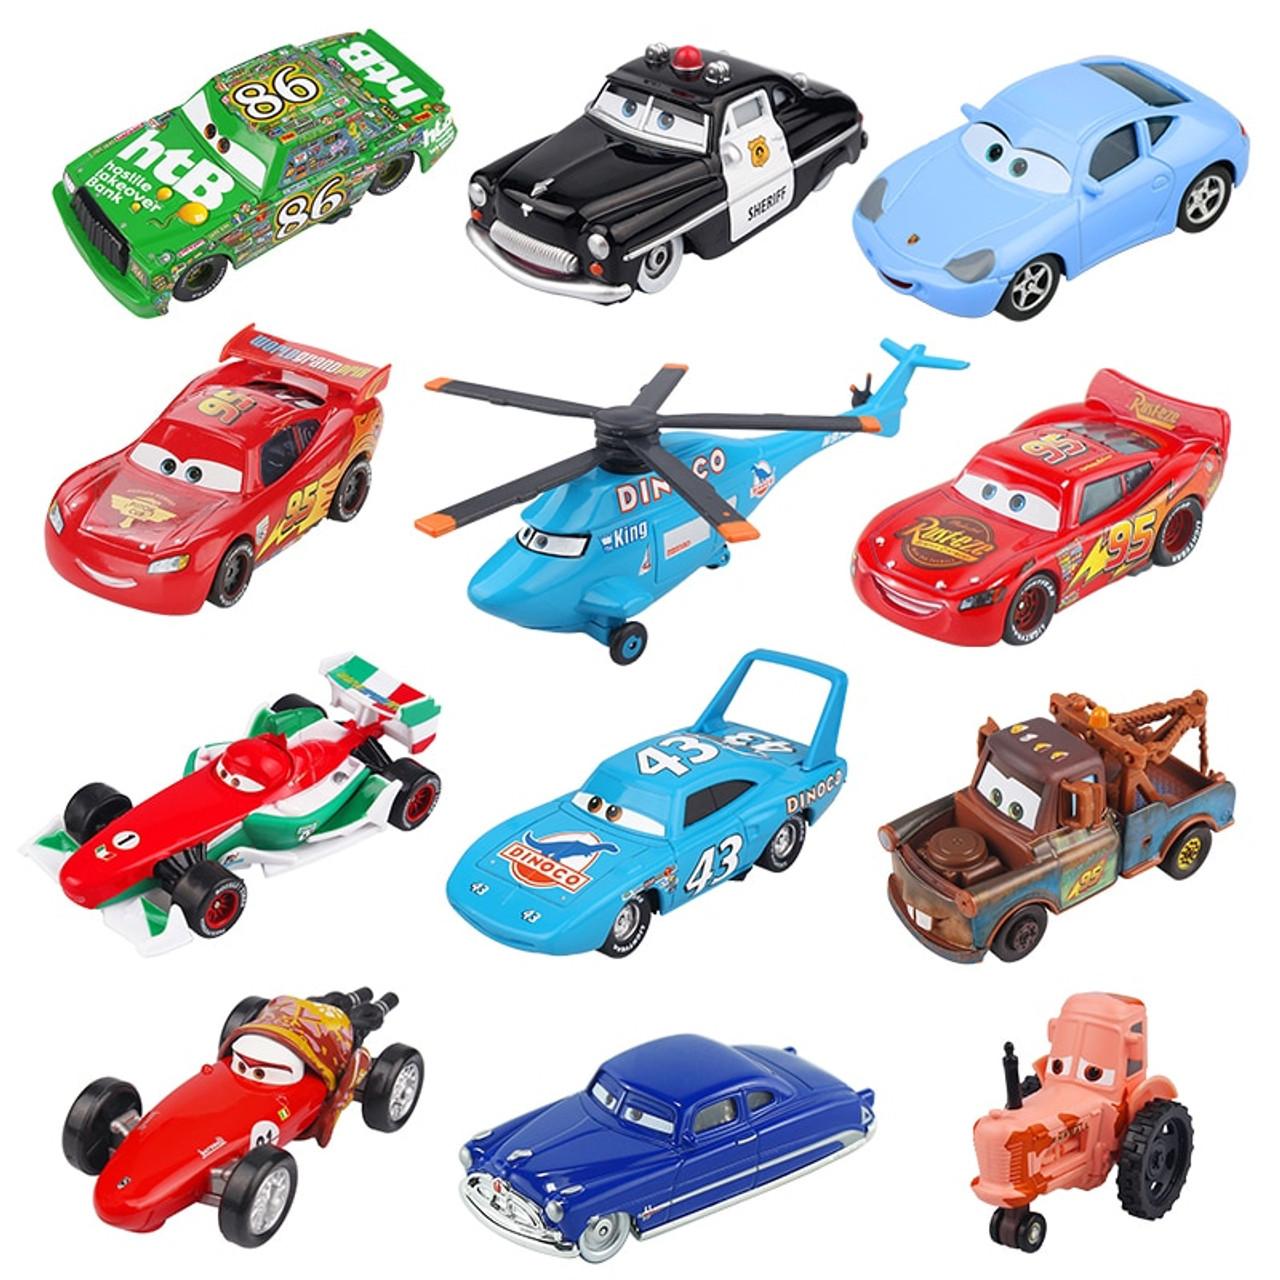 Disney Pixar Cars 2 3 Lightning McQueen Jackson Storm Doc Hudson Mater 1 55  Diecast Metal Alloy Model Car Birthday Gift Boy Toys - OnshopDeals.Com fa35ada1bea4